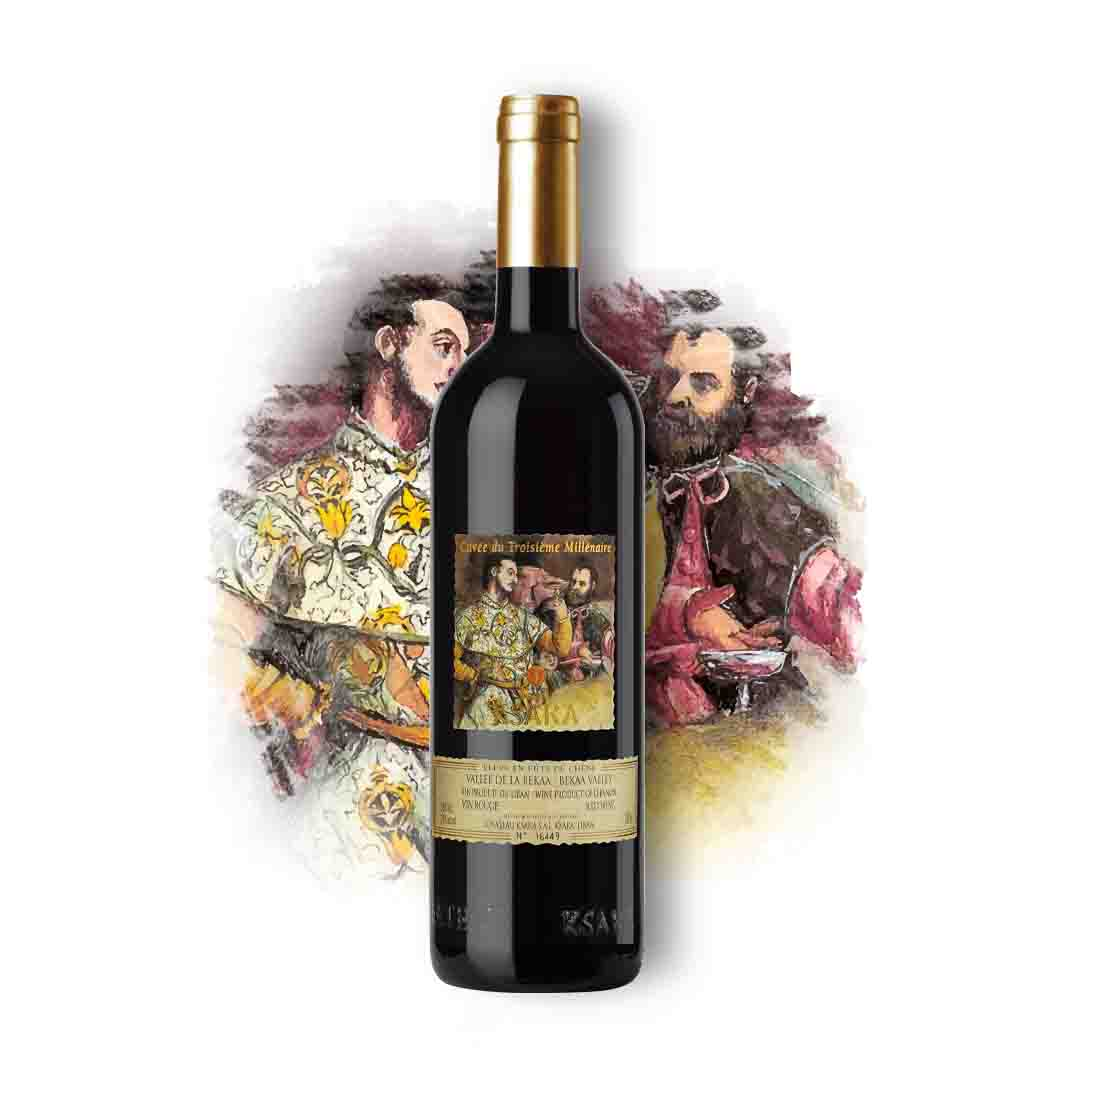 ksara collectible vintage Lebanese red wine 3eme millenaire petit verdot cabernet franc syrah bekaa